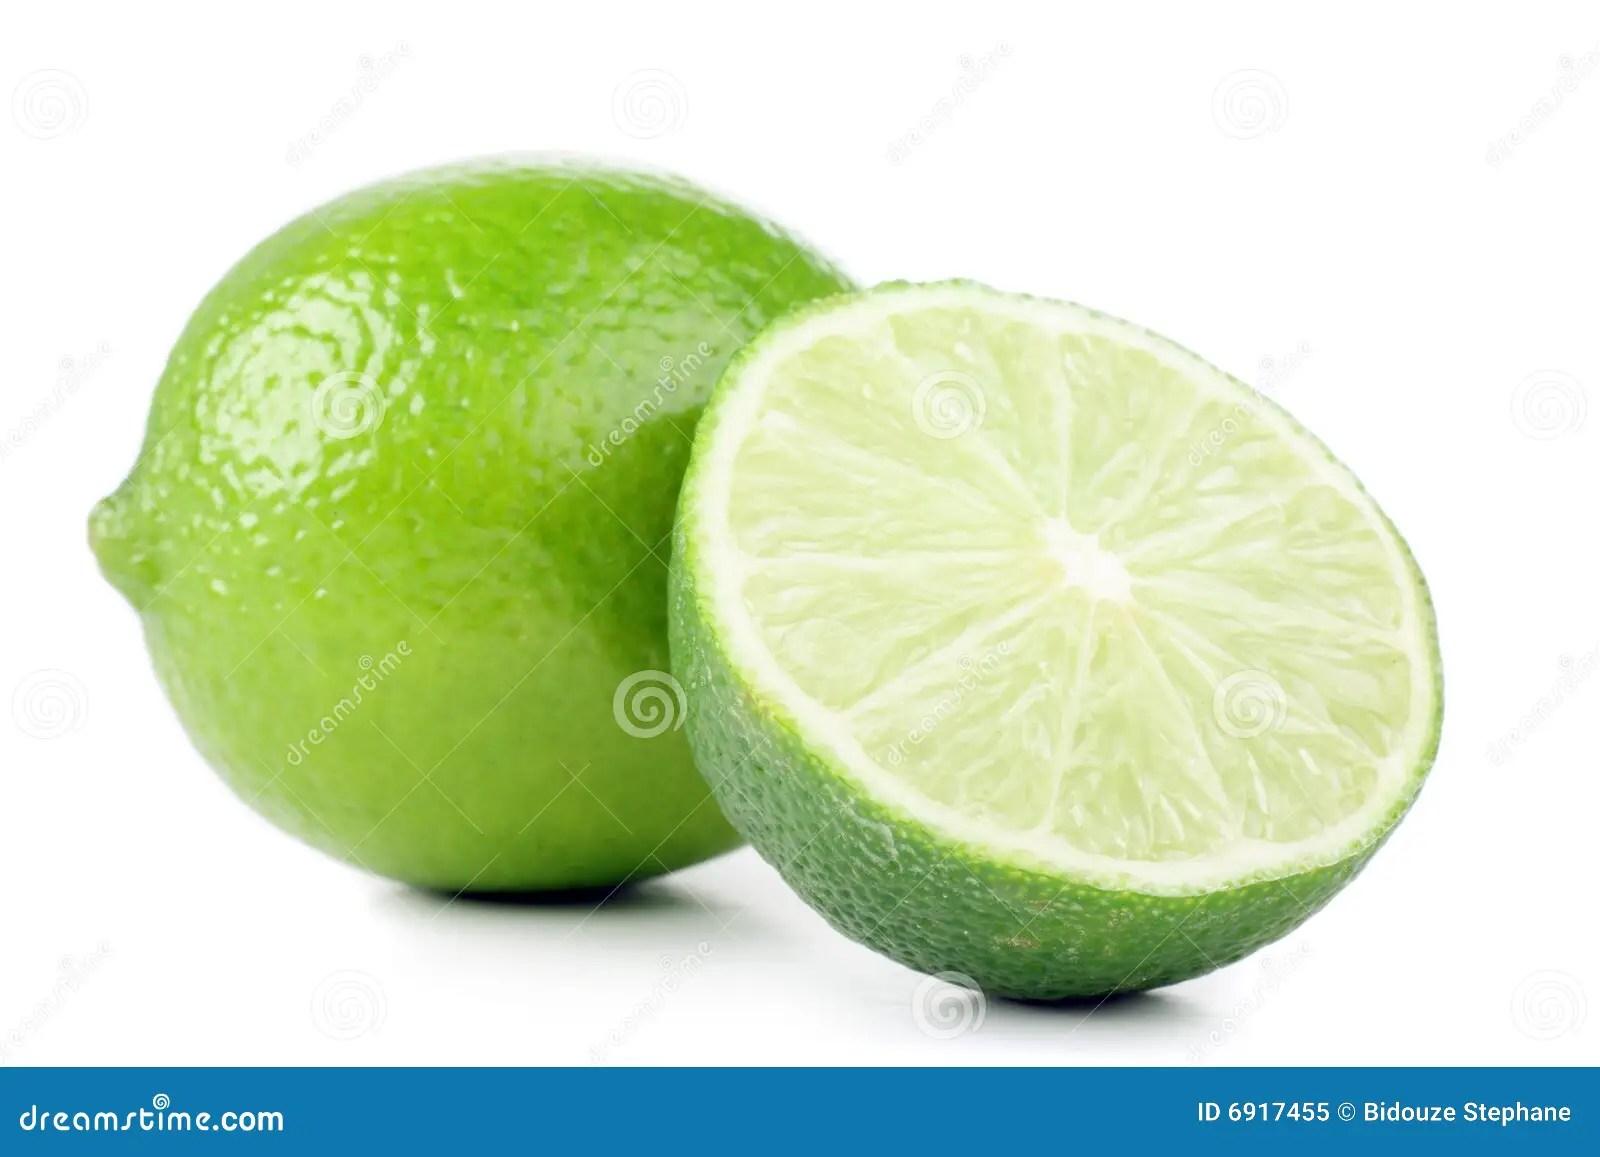 Wallpaper 3d Animado Green Lemon Royalty Free Stock Photo Image 6917455